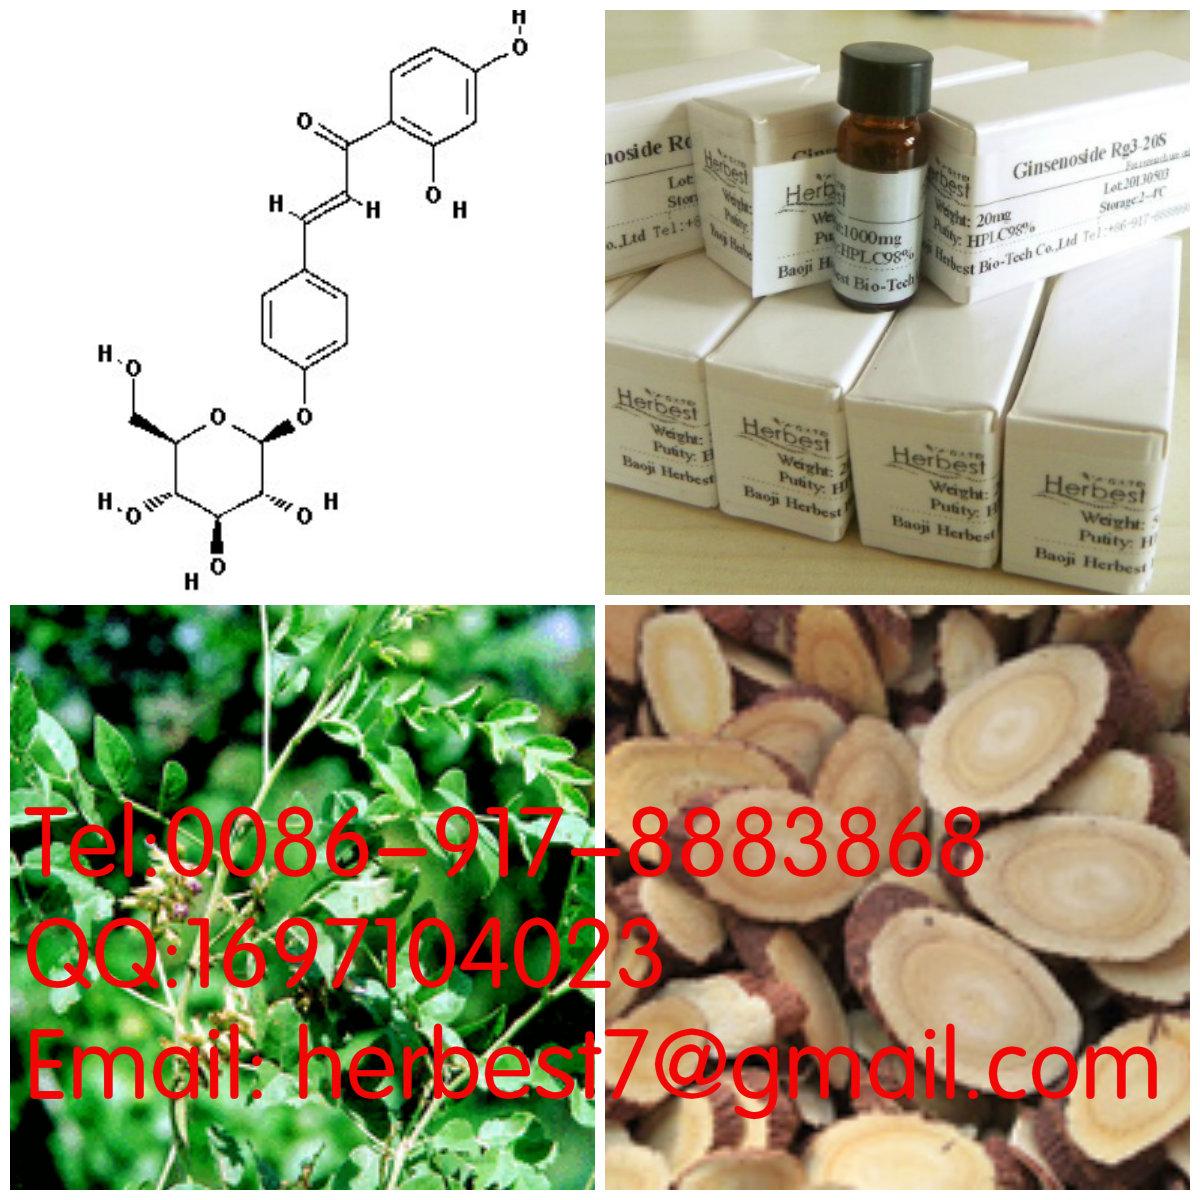 供应异甘草苷,5041-81-6,Isoliquiritin,98%对照品